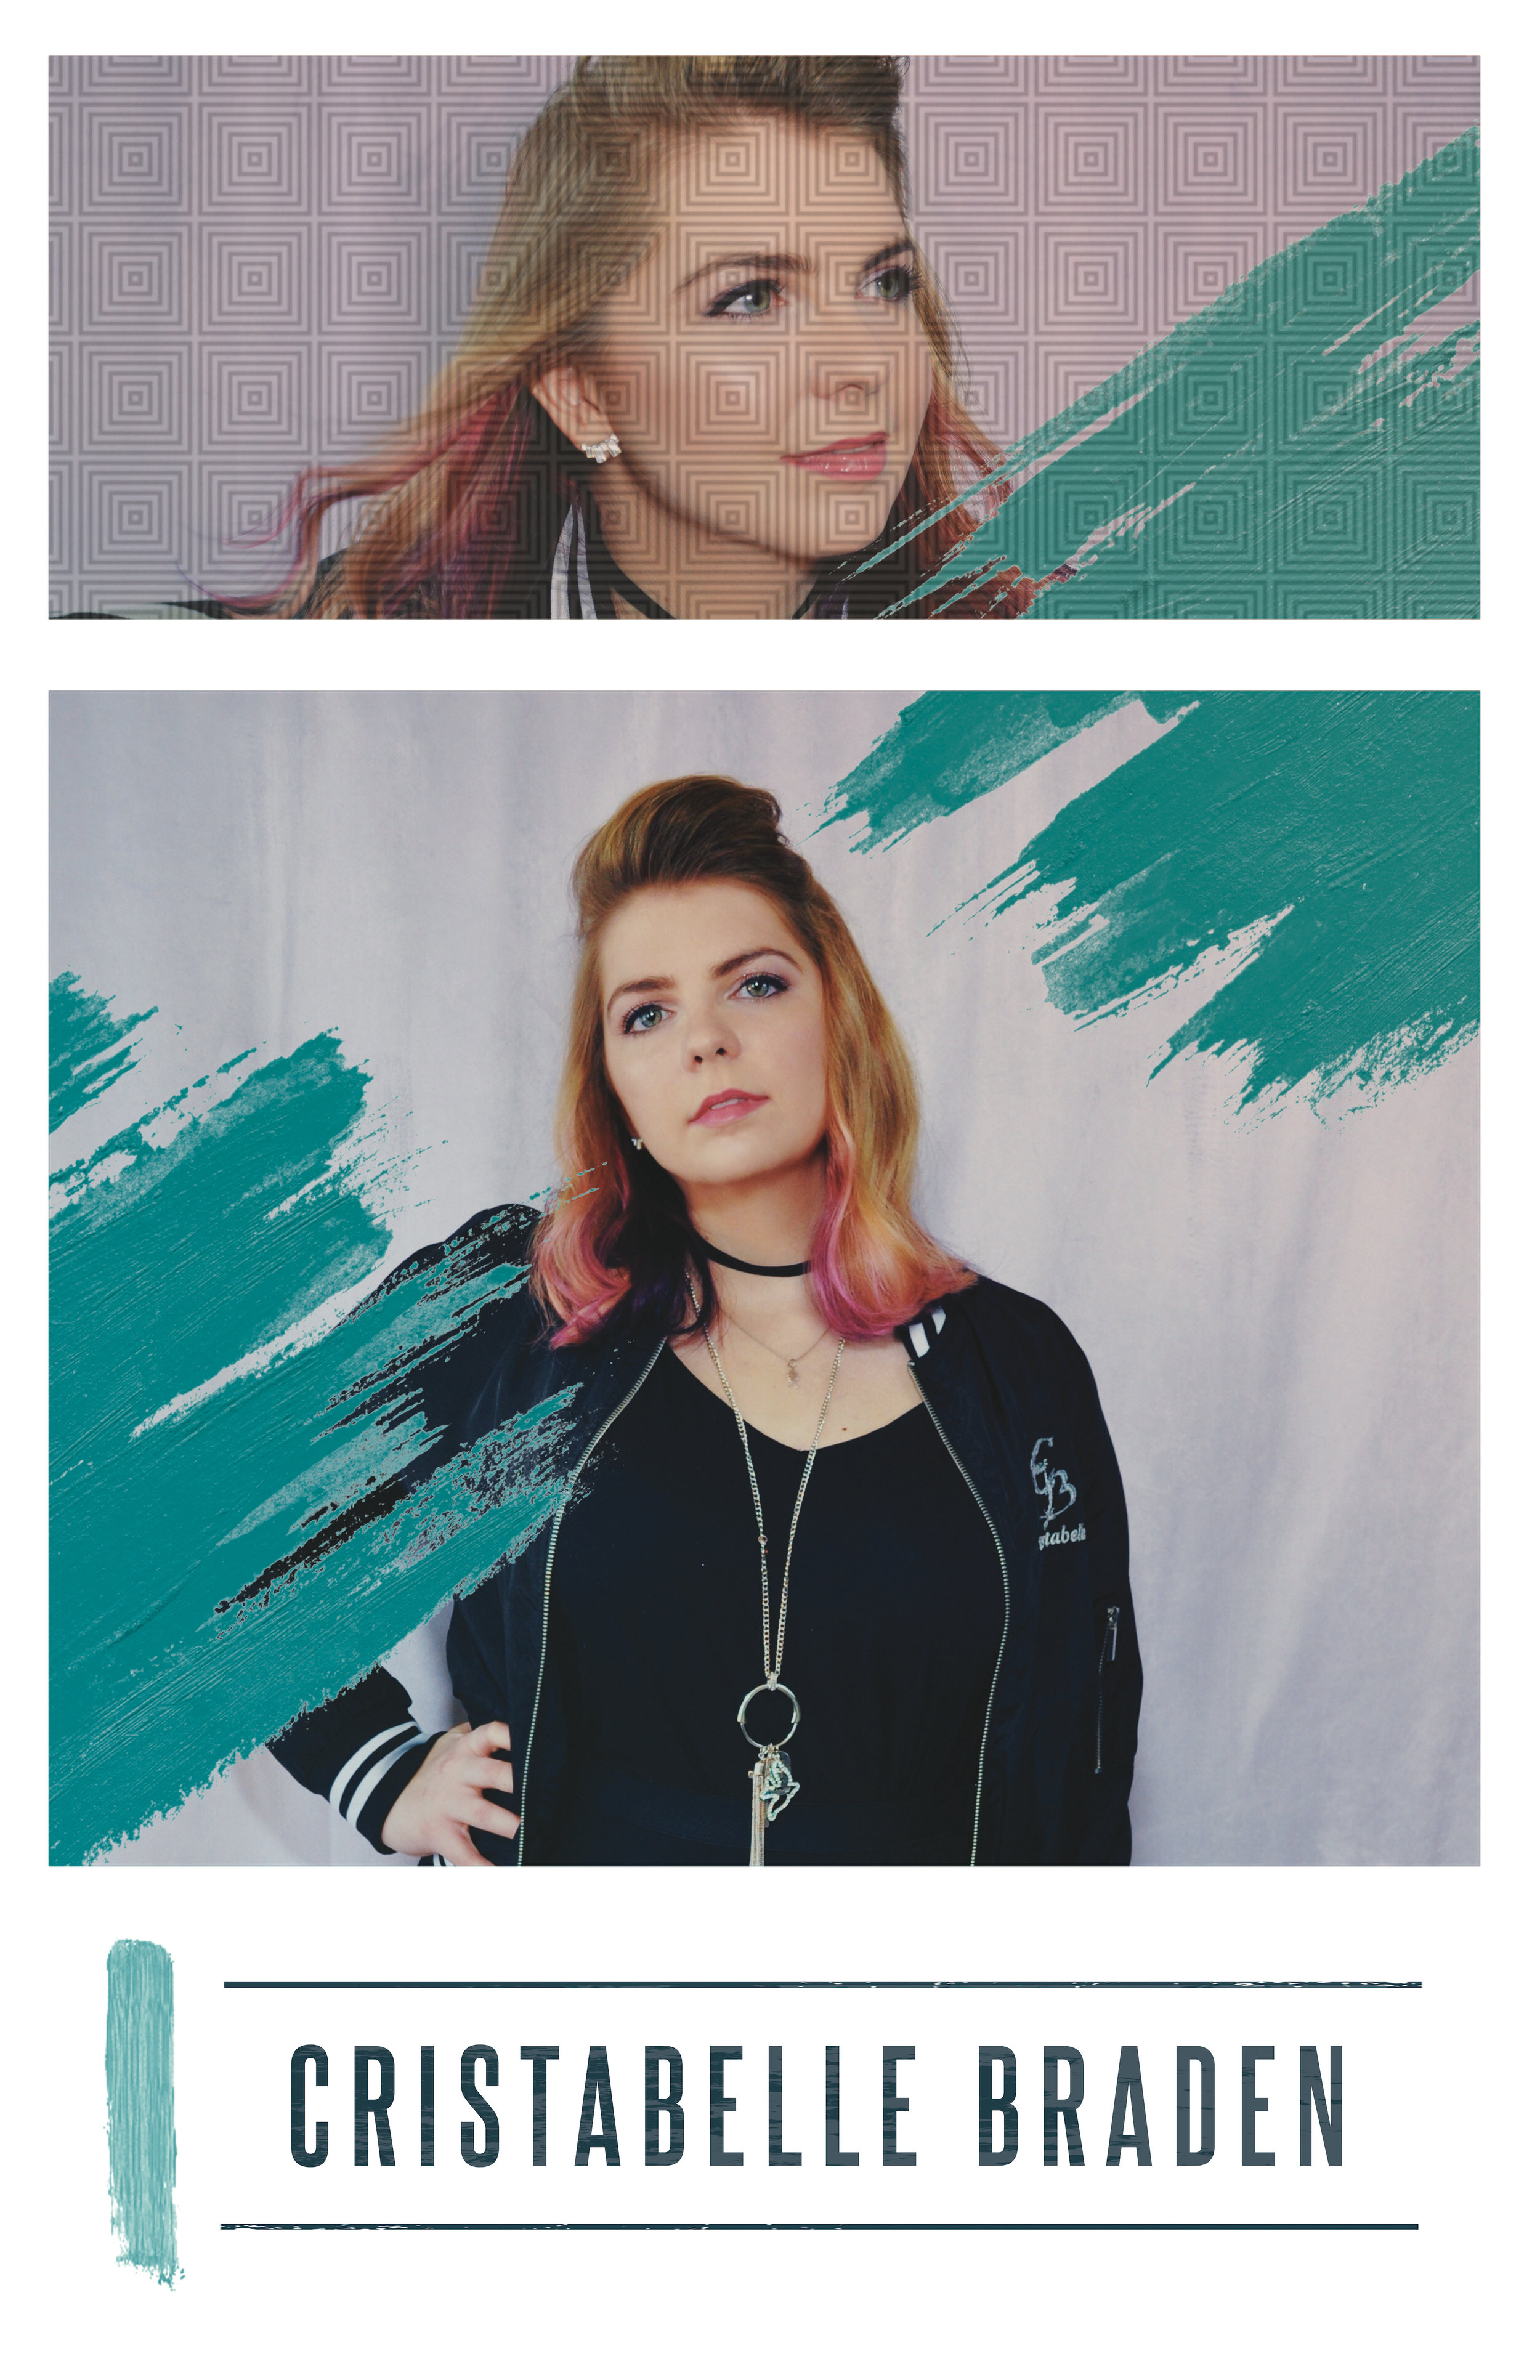 Cristabelle Braden - Artist Poster (2019) copy.jpg